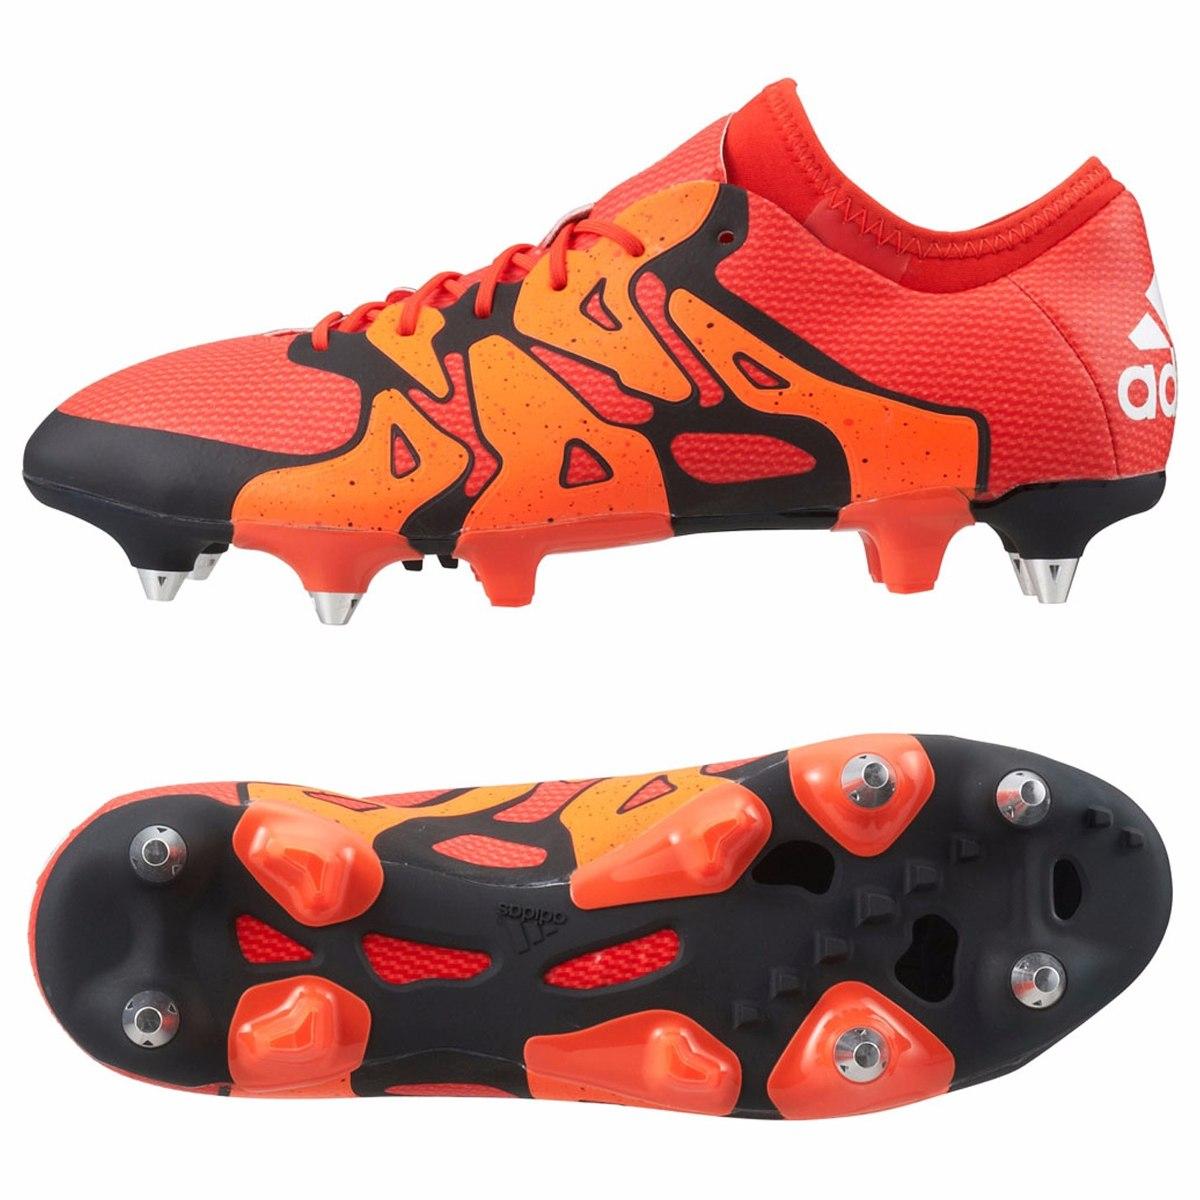 b13212825c15b zapatos futbol soccer profesionales x 15.1 sg adidas s83168. Cargando zoom.